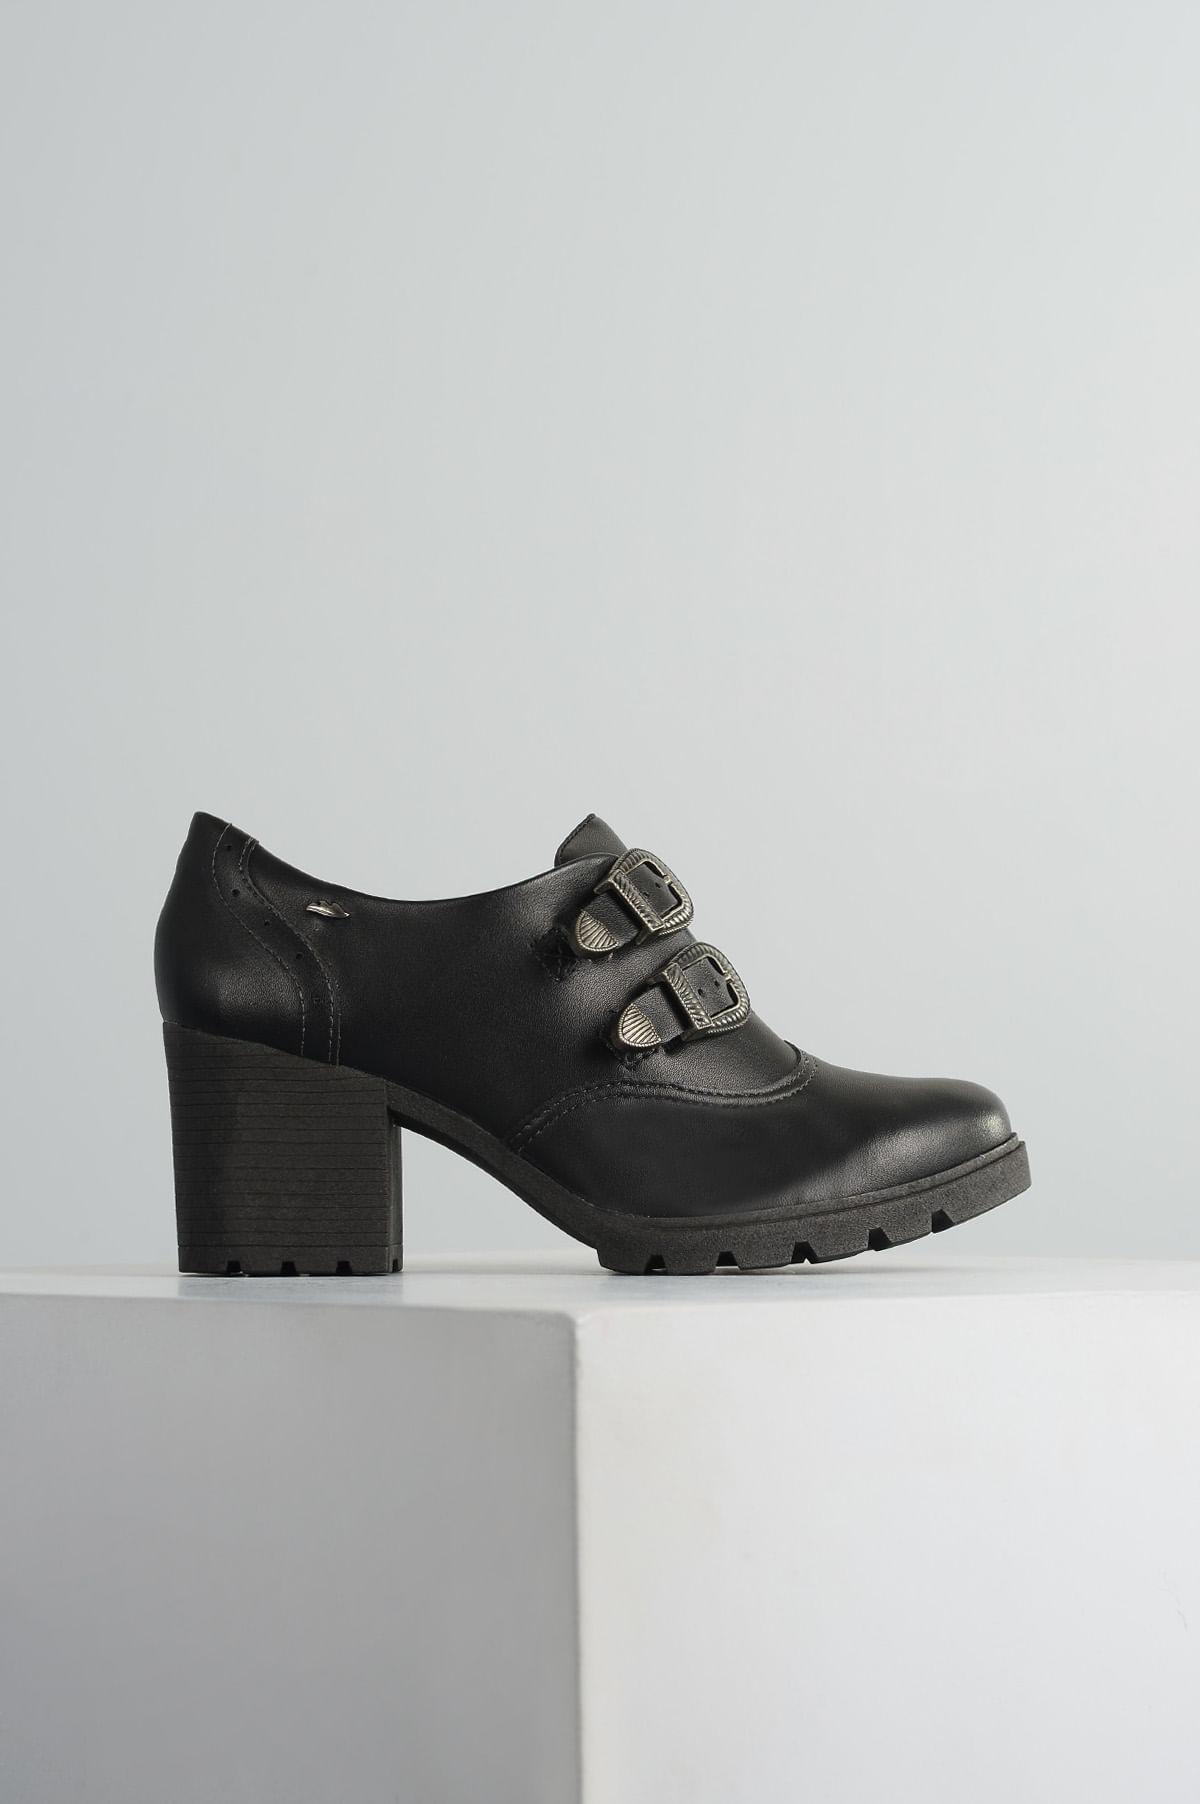 203ab3d653 Sapato Feminino Elyana Dakota SINT - PRETO - Mundial Calçados